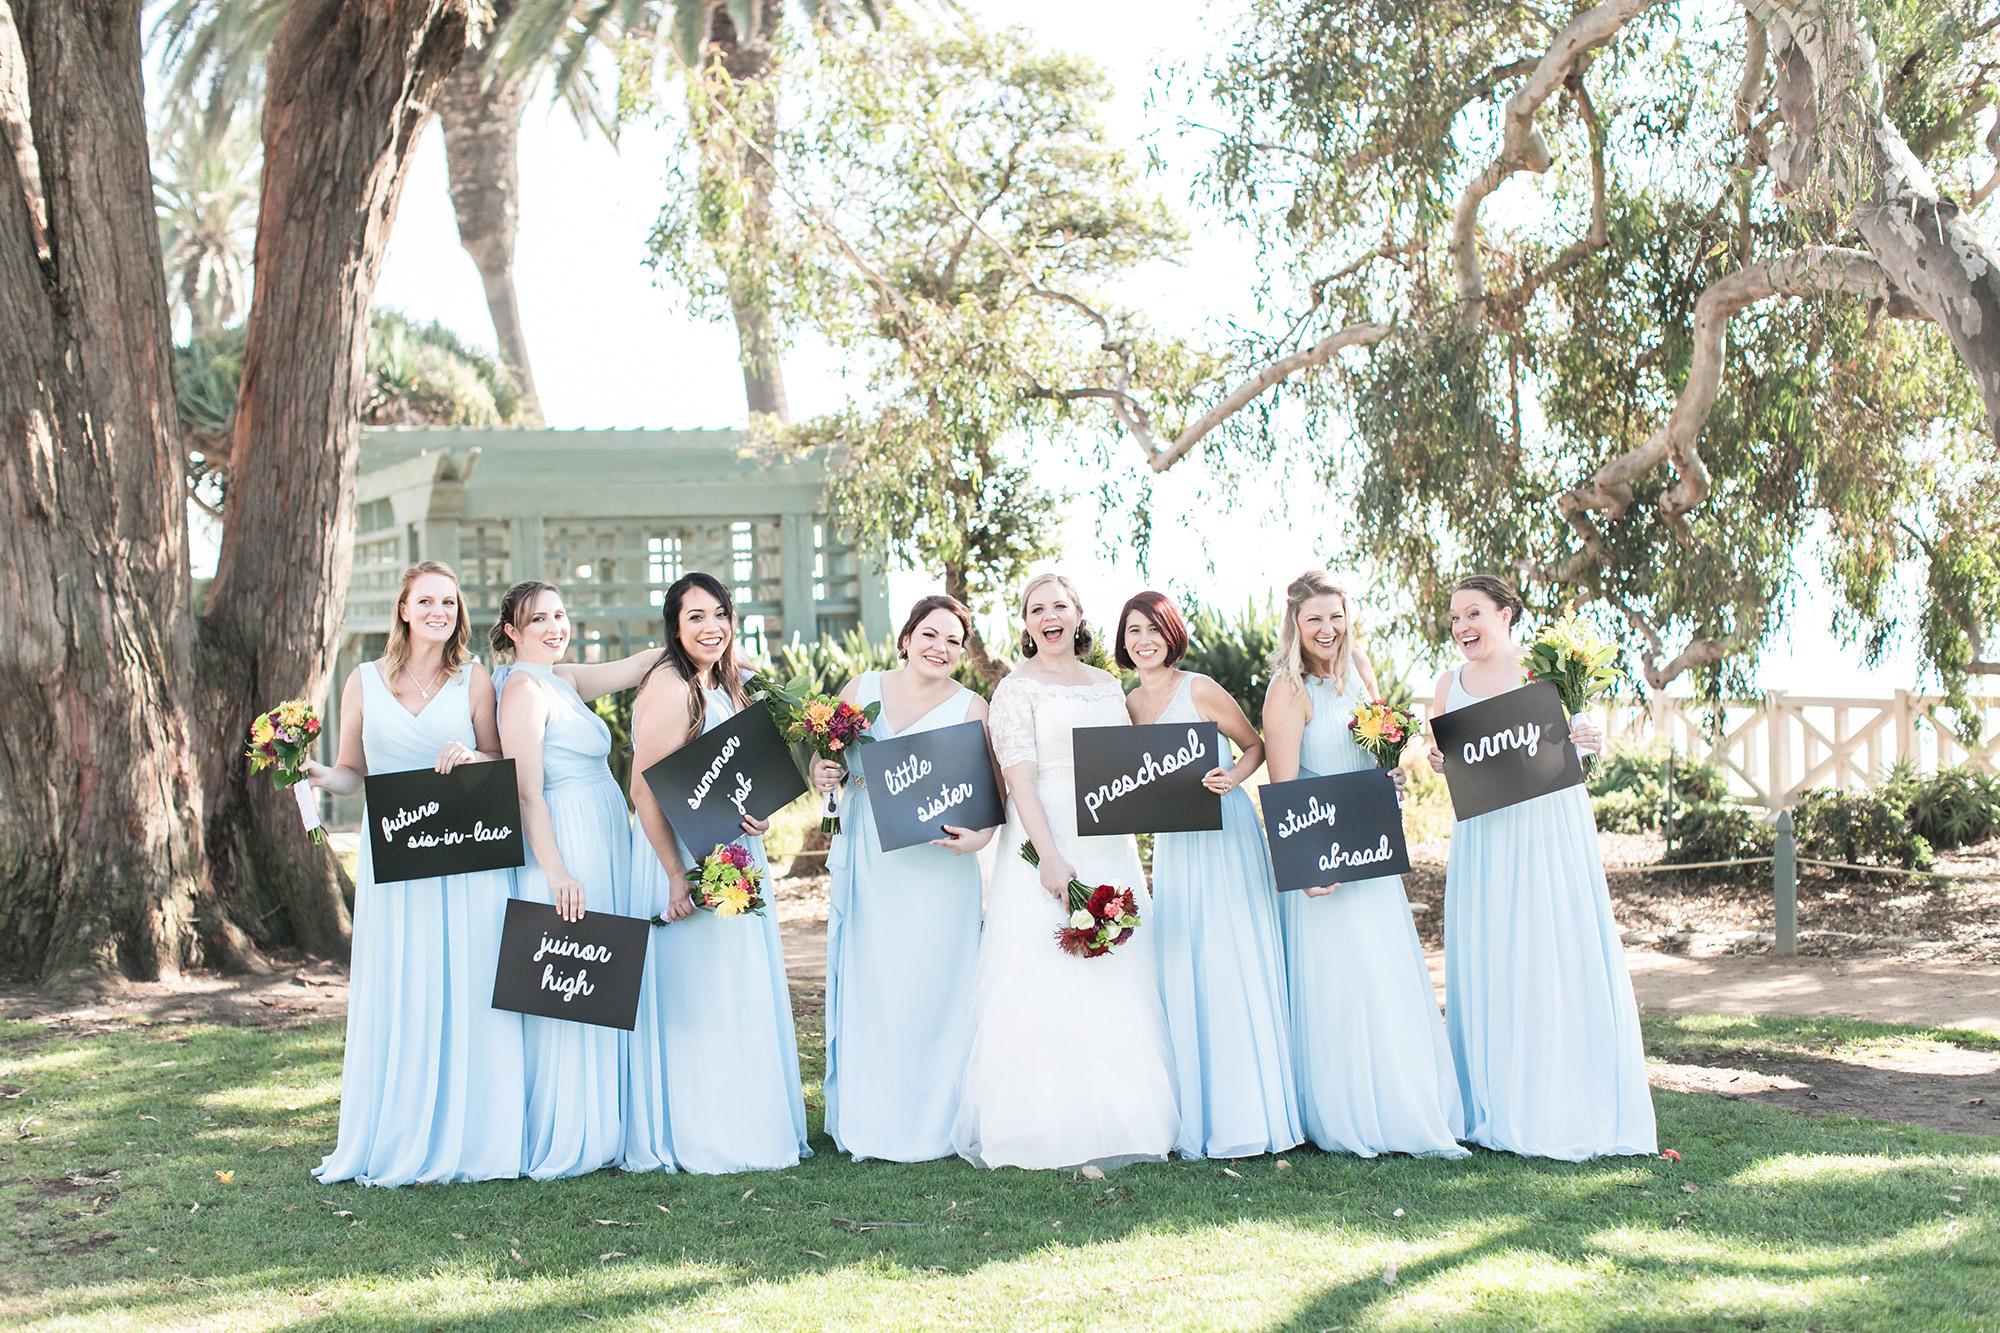 unforgettable-st-monica-wedding-carrie-vines-photography-047.jpg